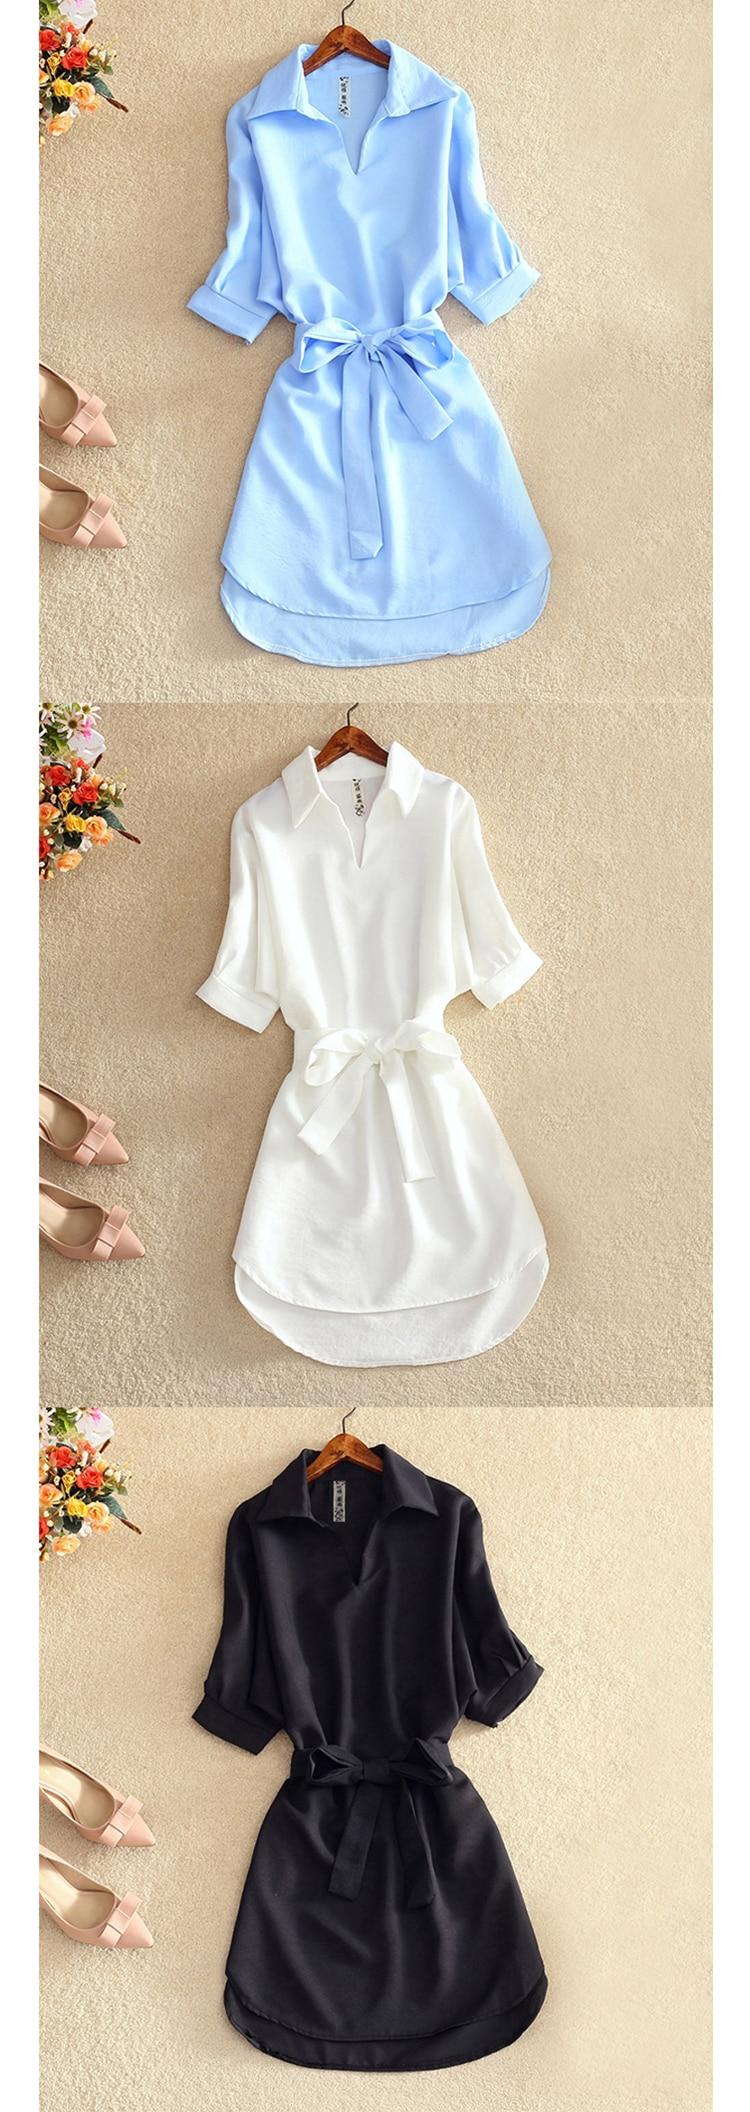 Summer Casual Dress Shirts 9